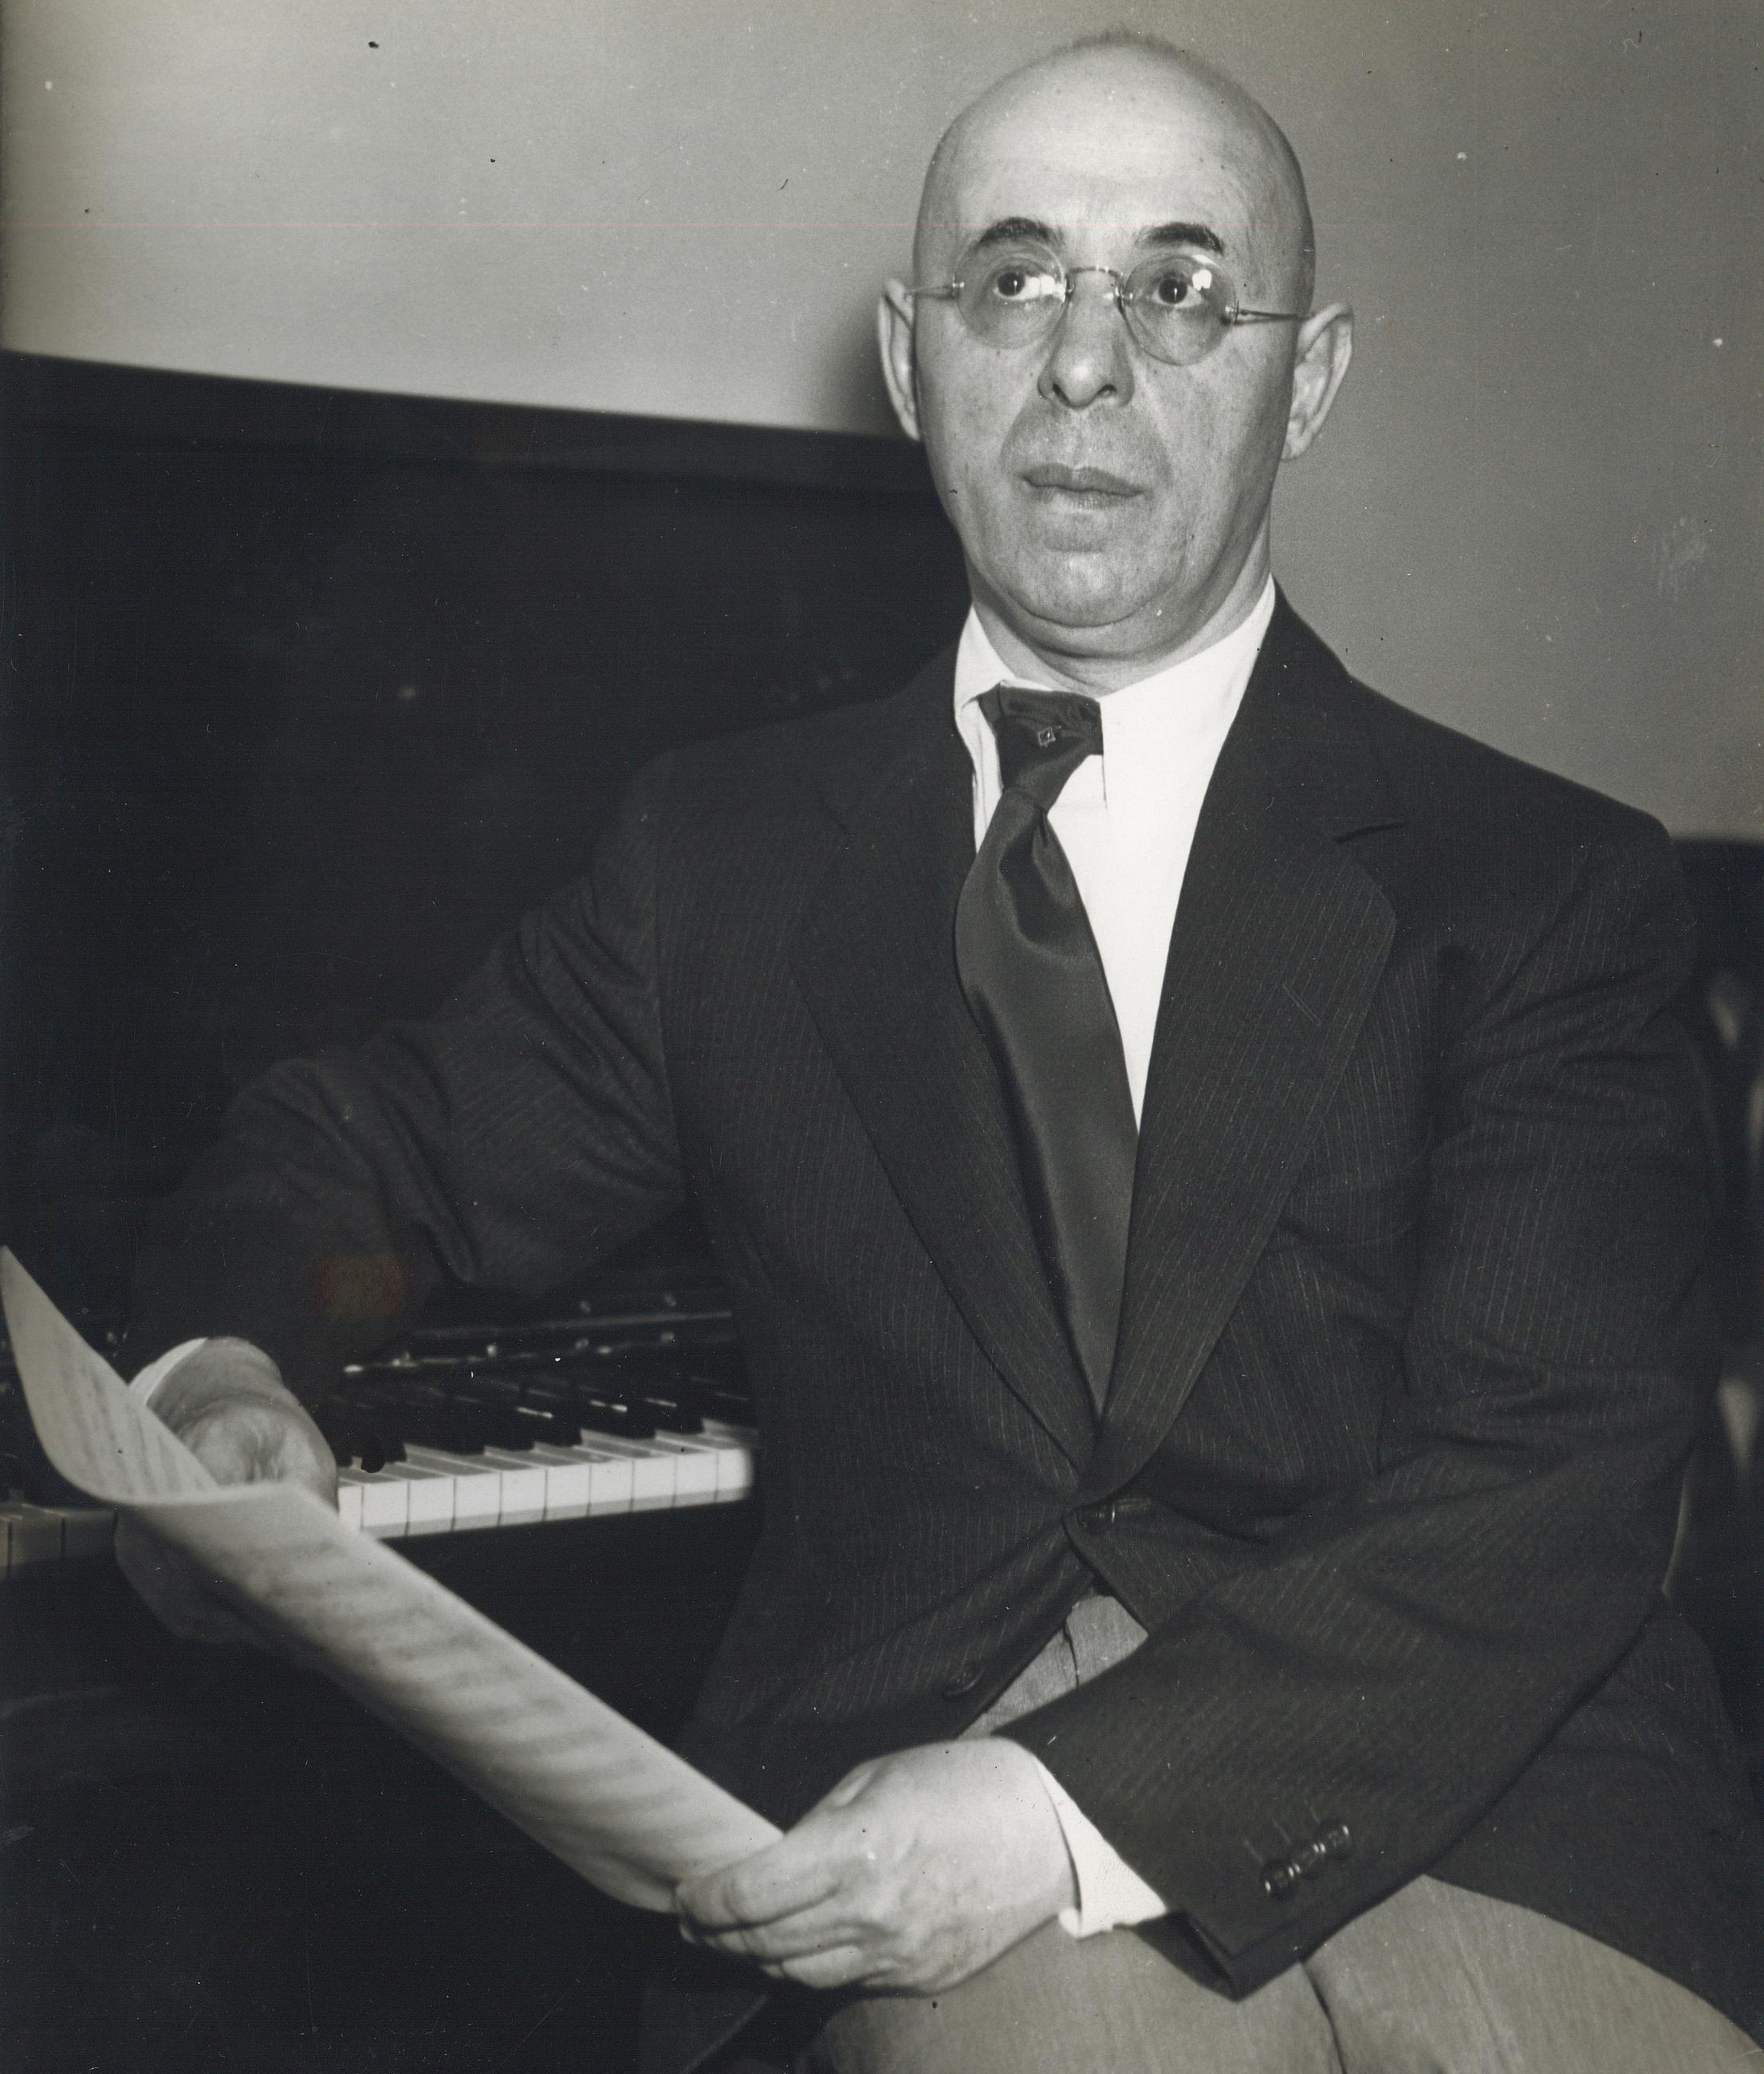 Lazar Saminsky